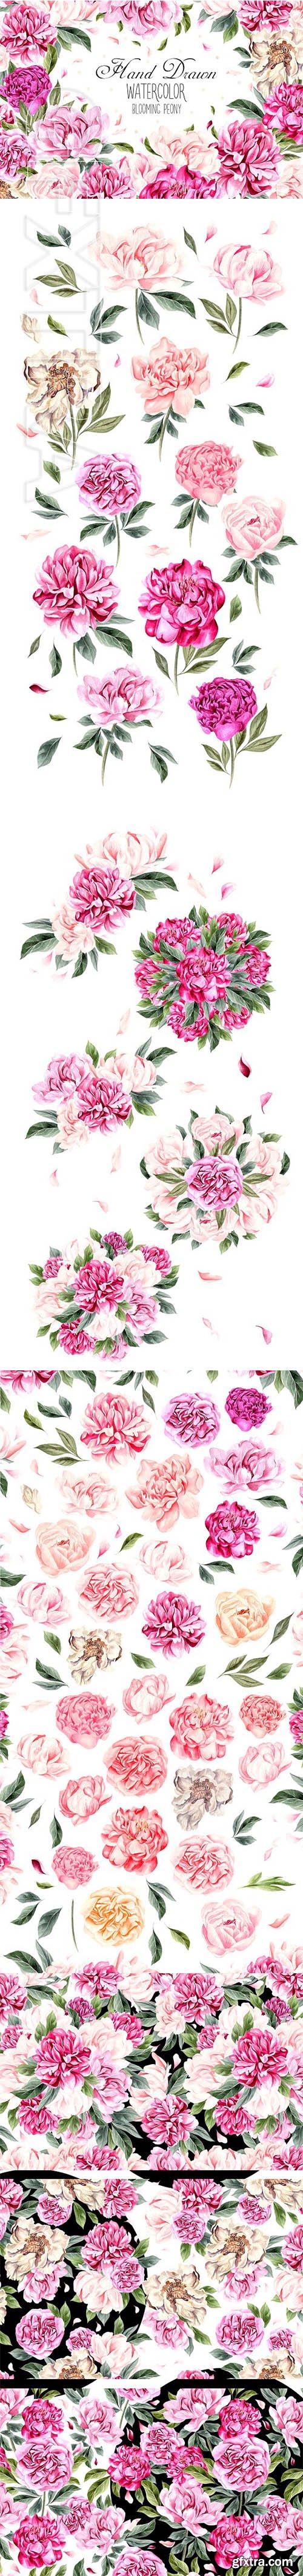 CreativeMarket - Hand Drawn Watercolor Blooming Peony 2683465